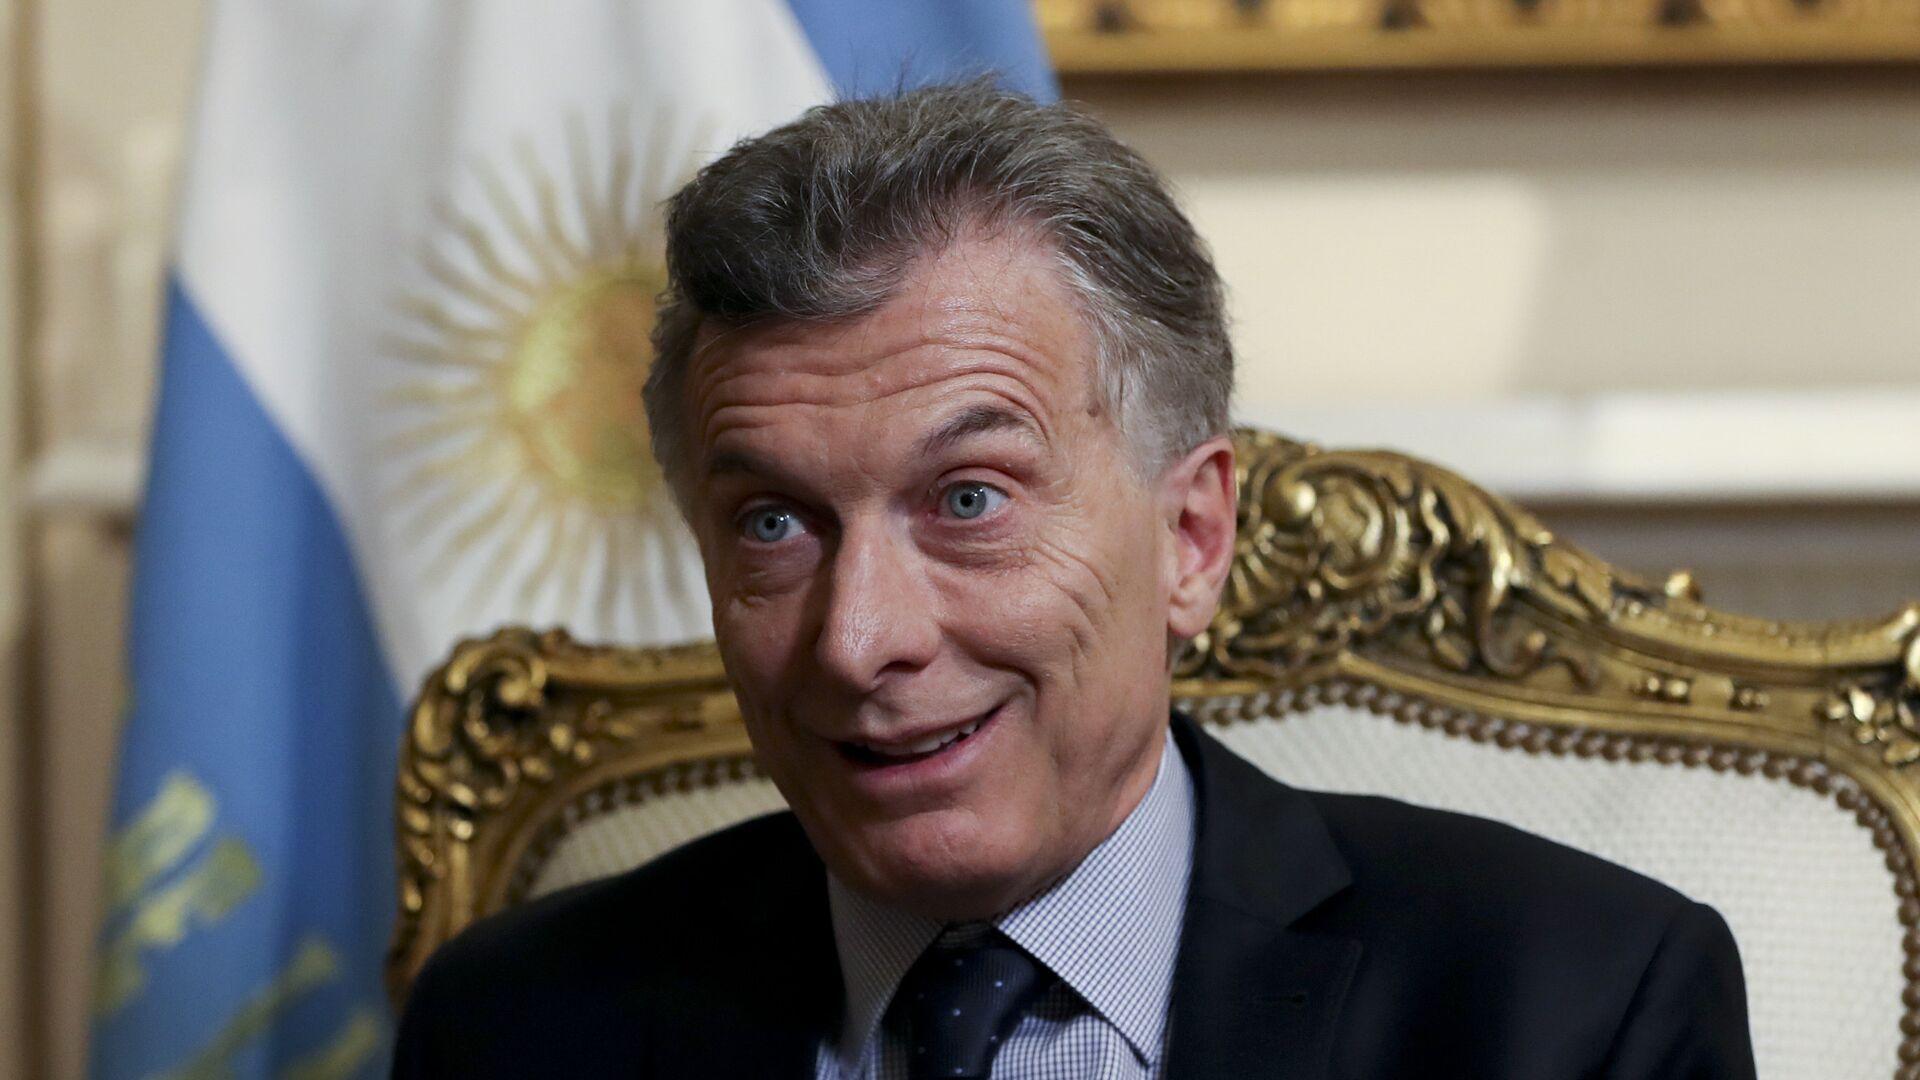 El presidente de Argentina, Mauricio Macri - Sputnik Mundo, 1920, 09.07.2021